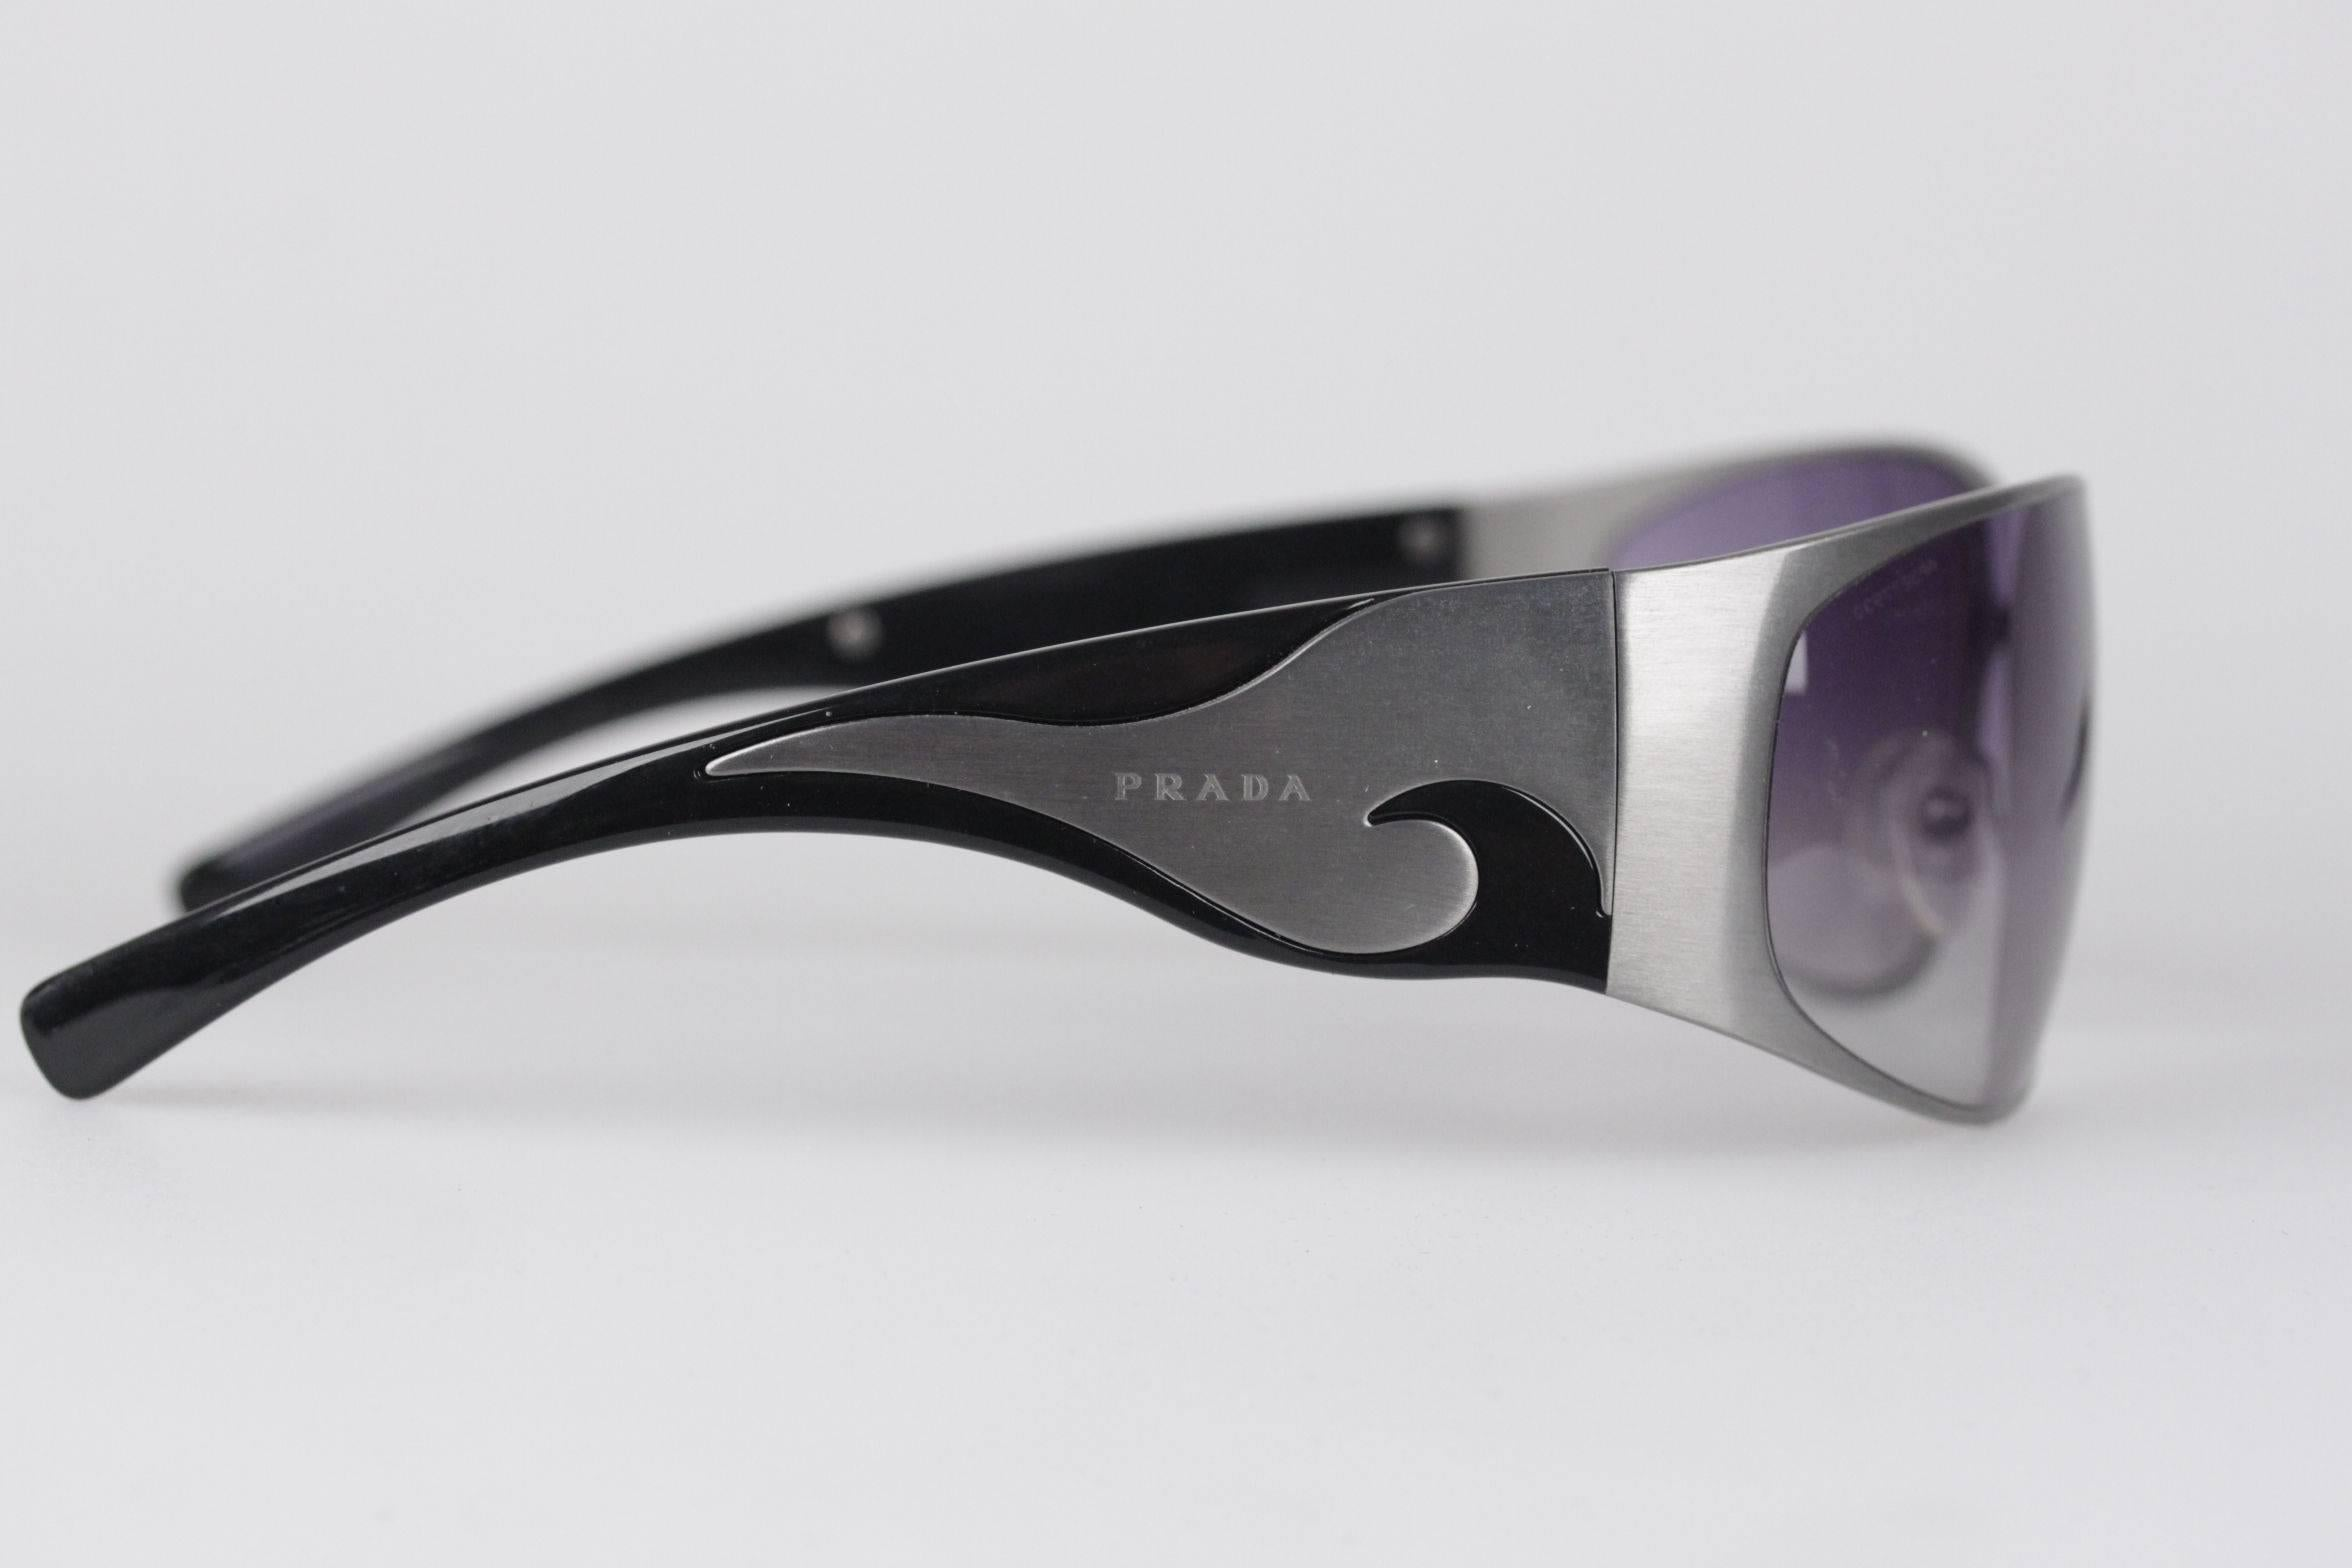 72338acb3165 2au 4k0 027a8 a536a greece prada new wrap silver metal and black womens  sunglasses spr 50g 63mm 115 for sale ...